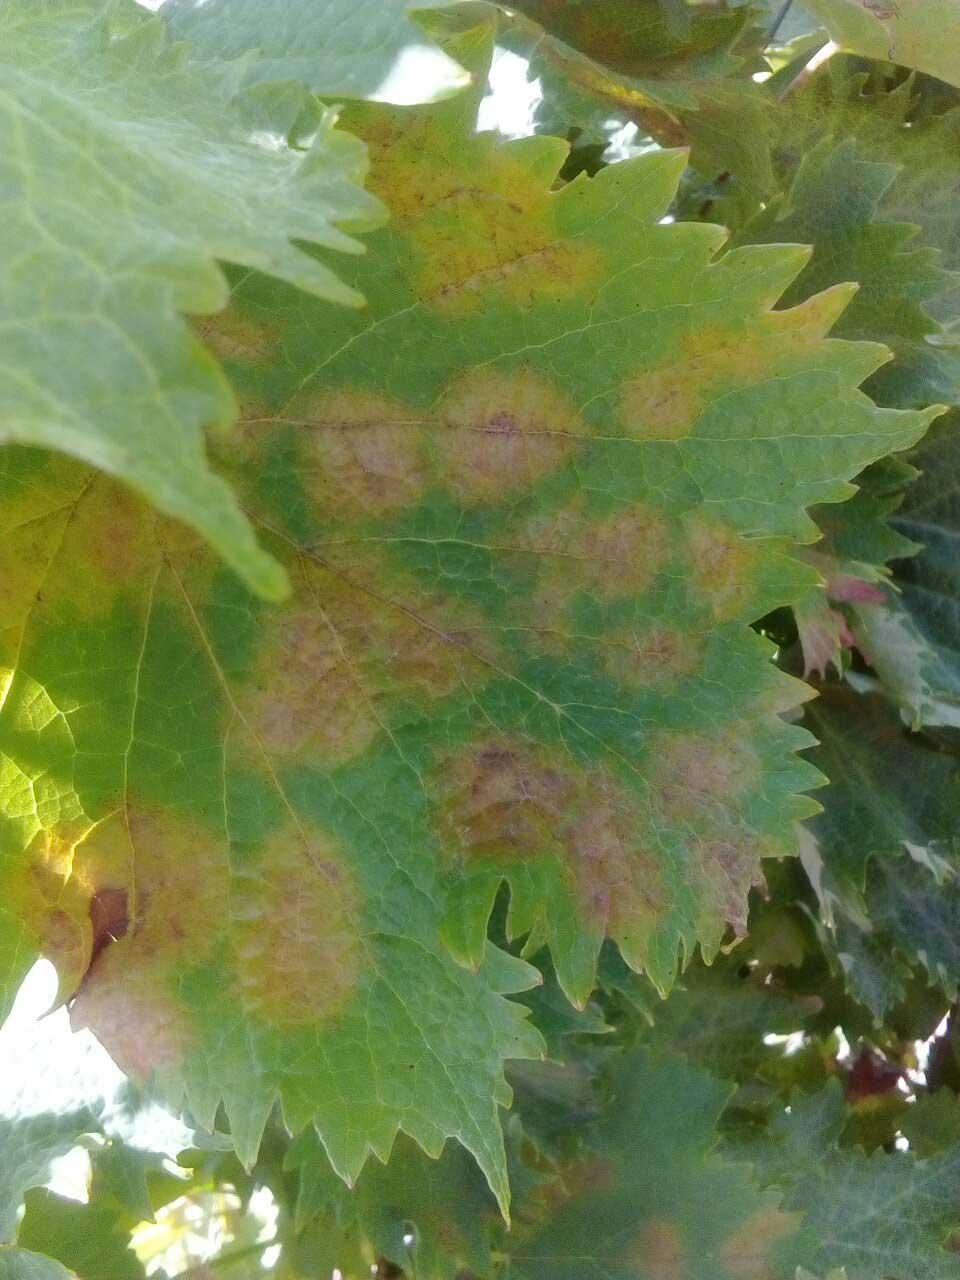 Agrosaveti---Galenika-Fitofarmacija---Plamenjaca-vinova-loza